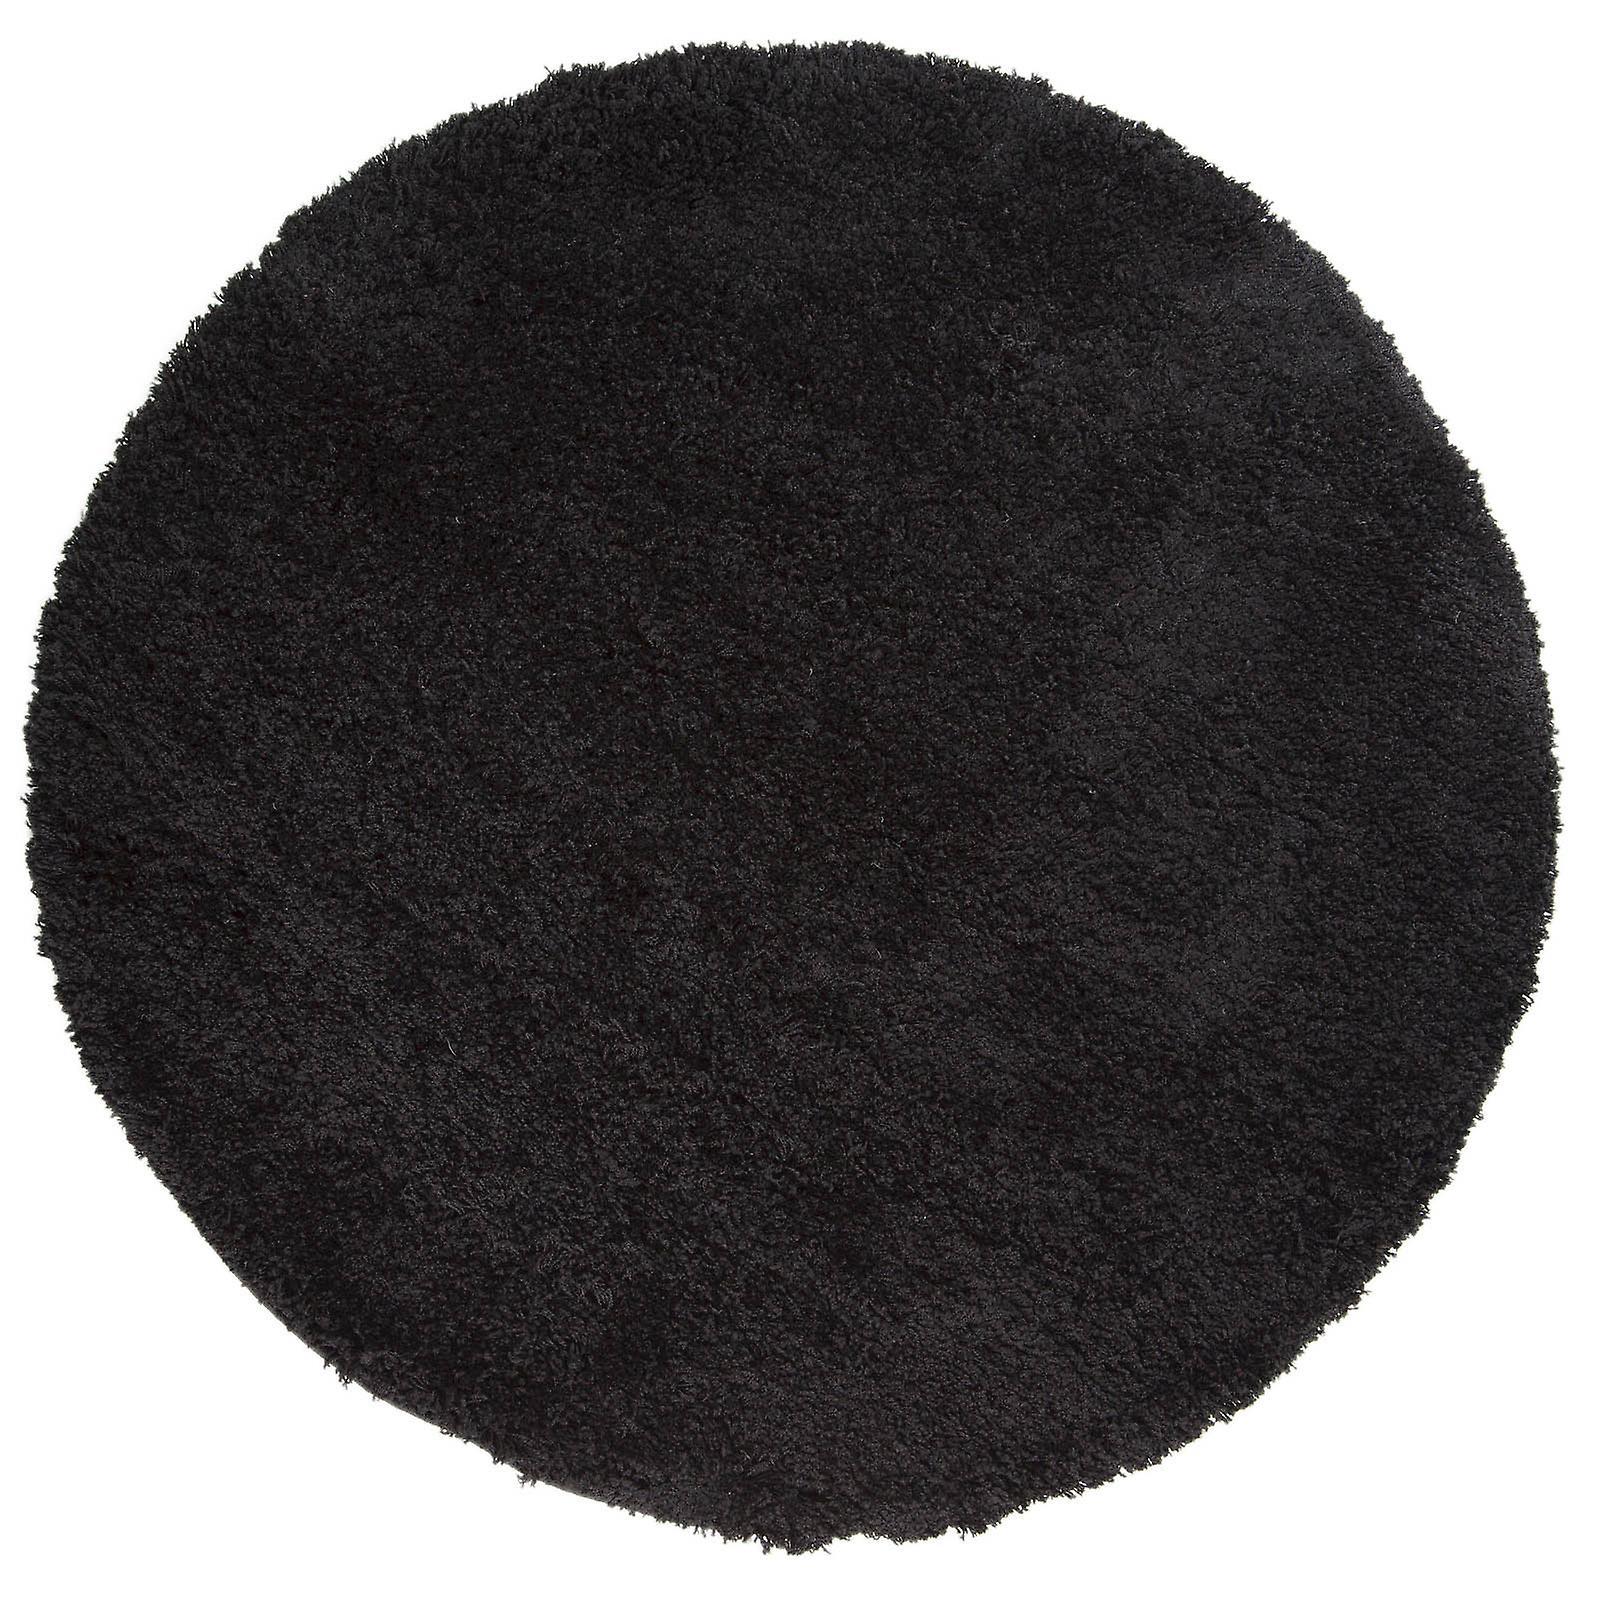 Cariboo Shaggy Circle Rugs In noir